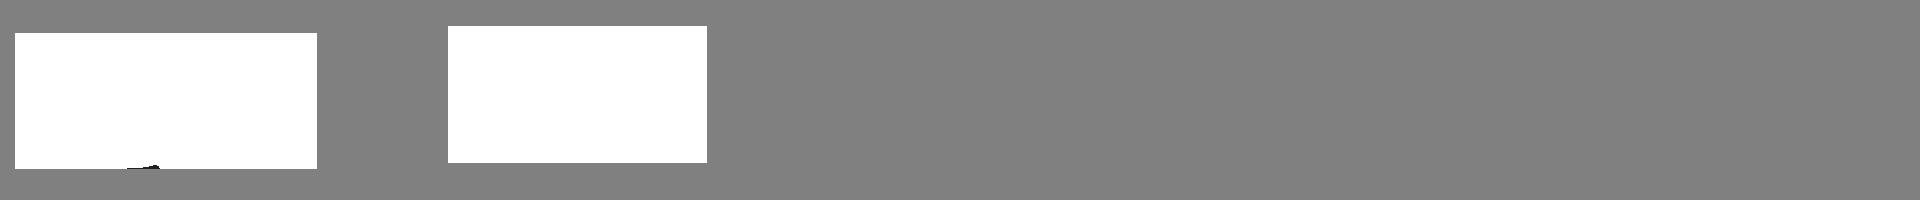 Logo-banner-for-web.png